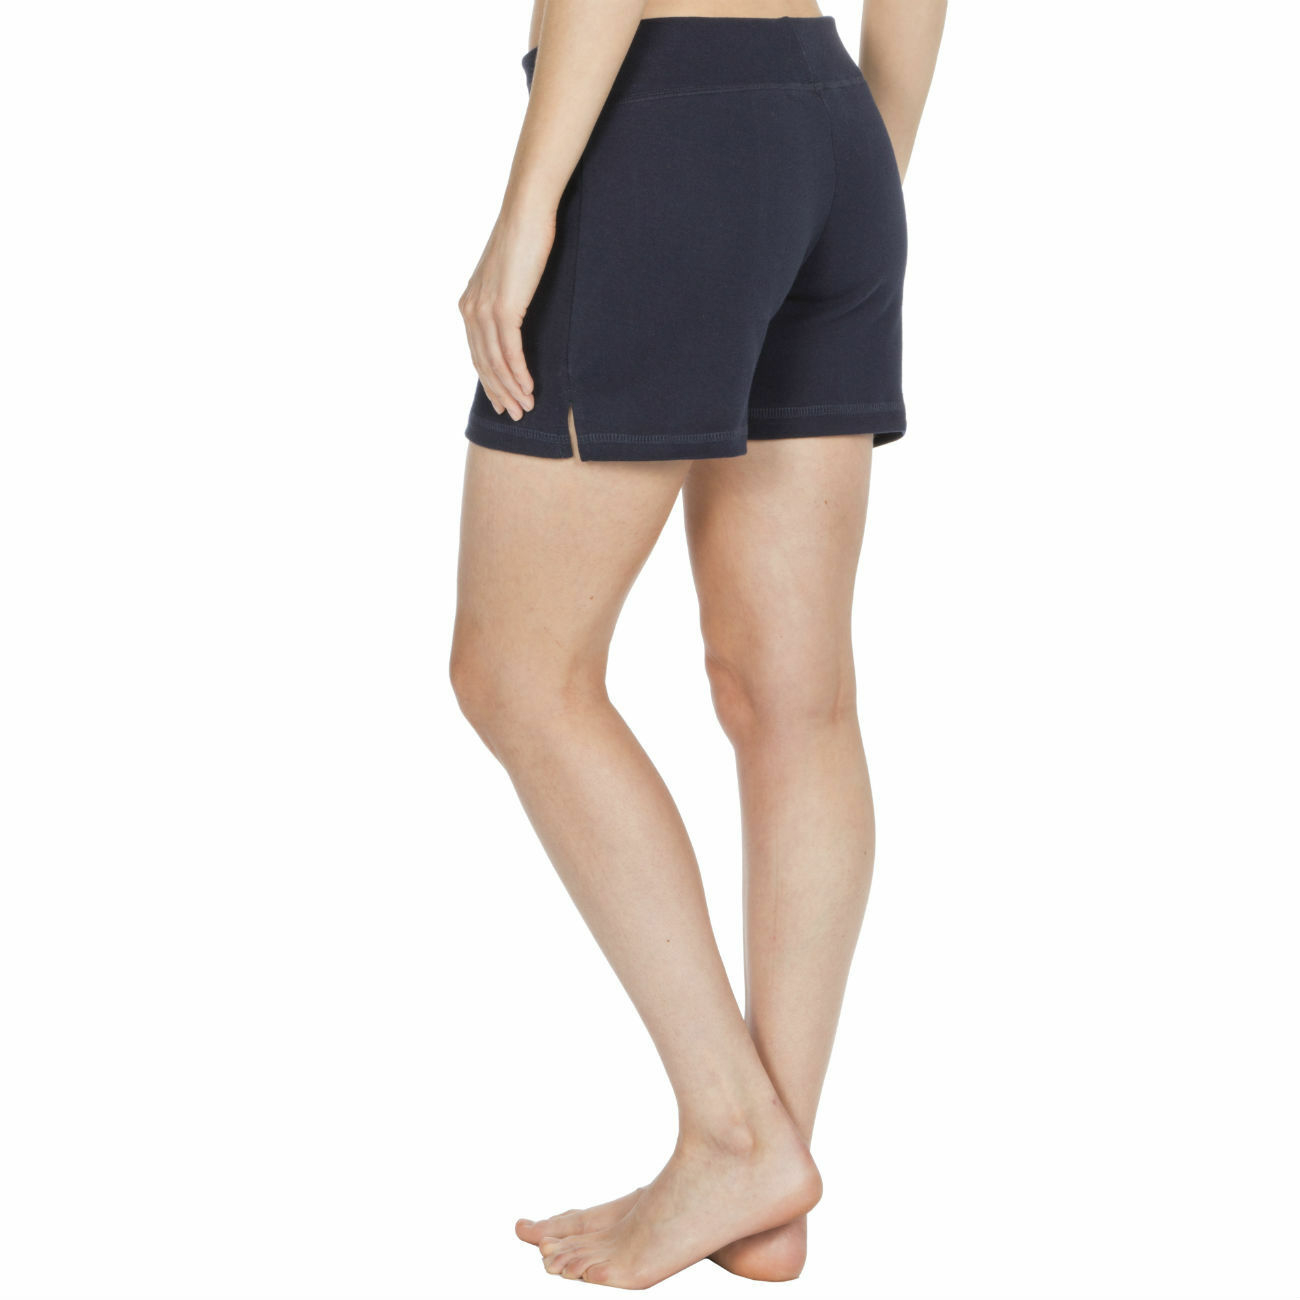 Womens-Cotton-Jersey-Shorts-Elastic-Waist-Summer-Beach-Casual-Yoga-Hot-Pants-New thumbnail 13